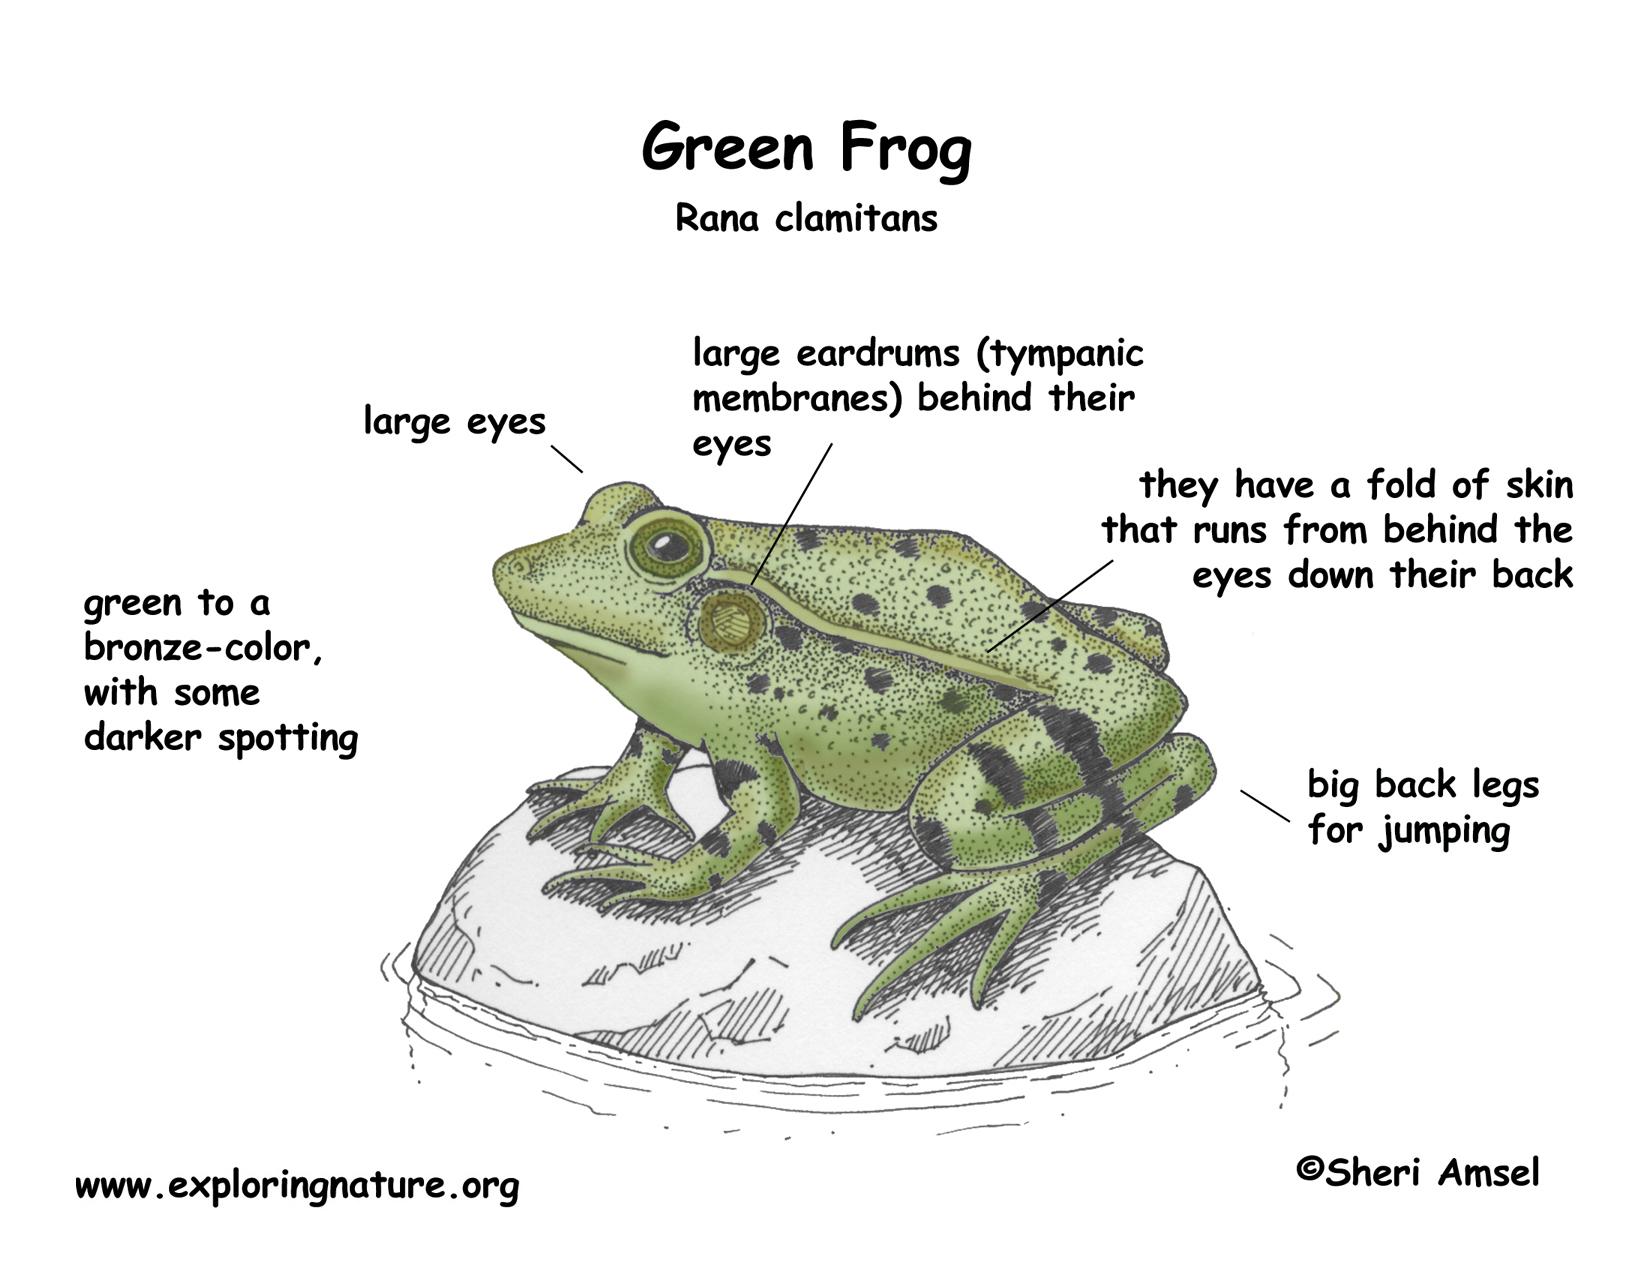 Frog Green